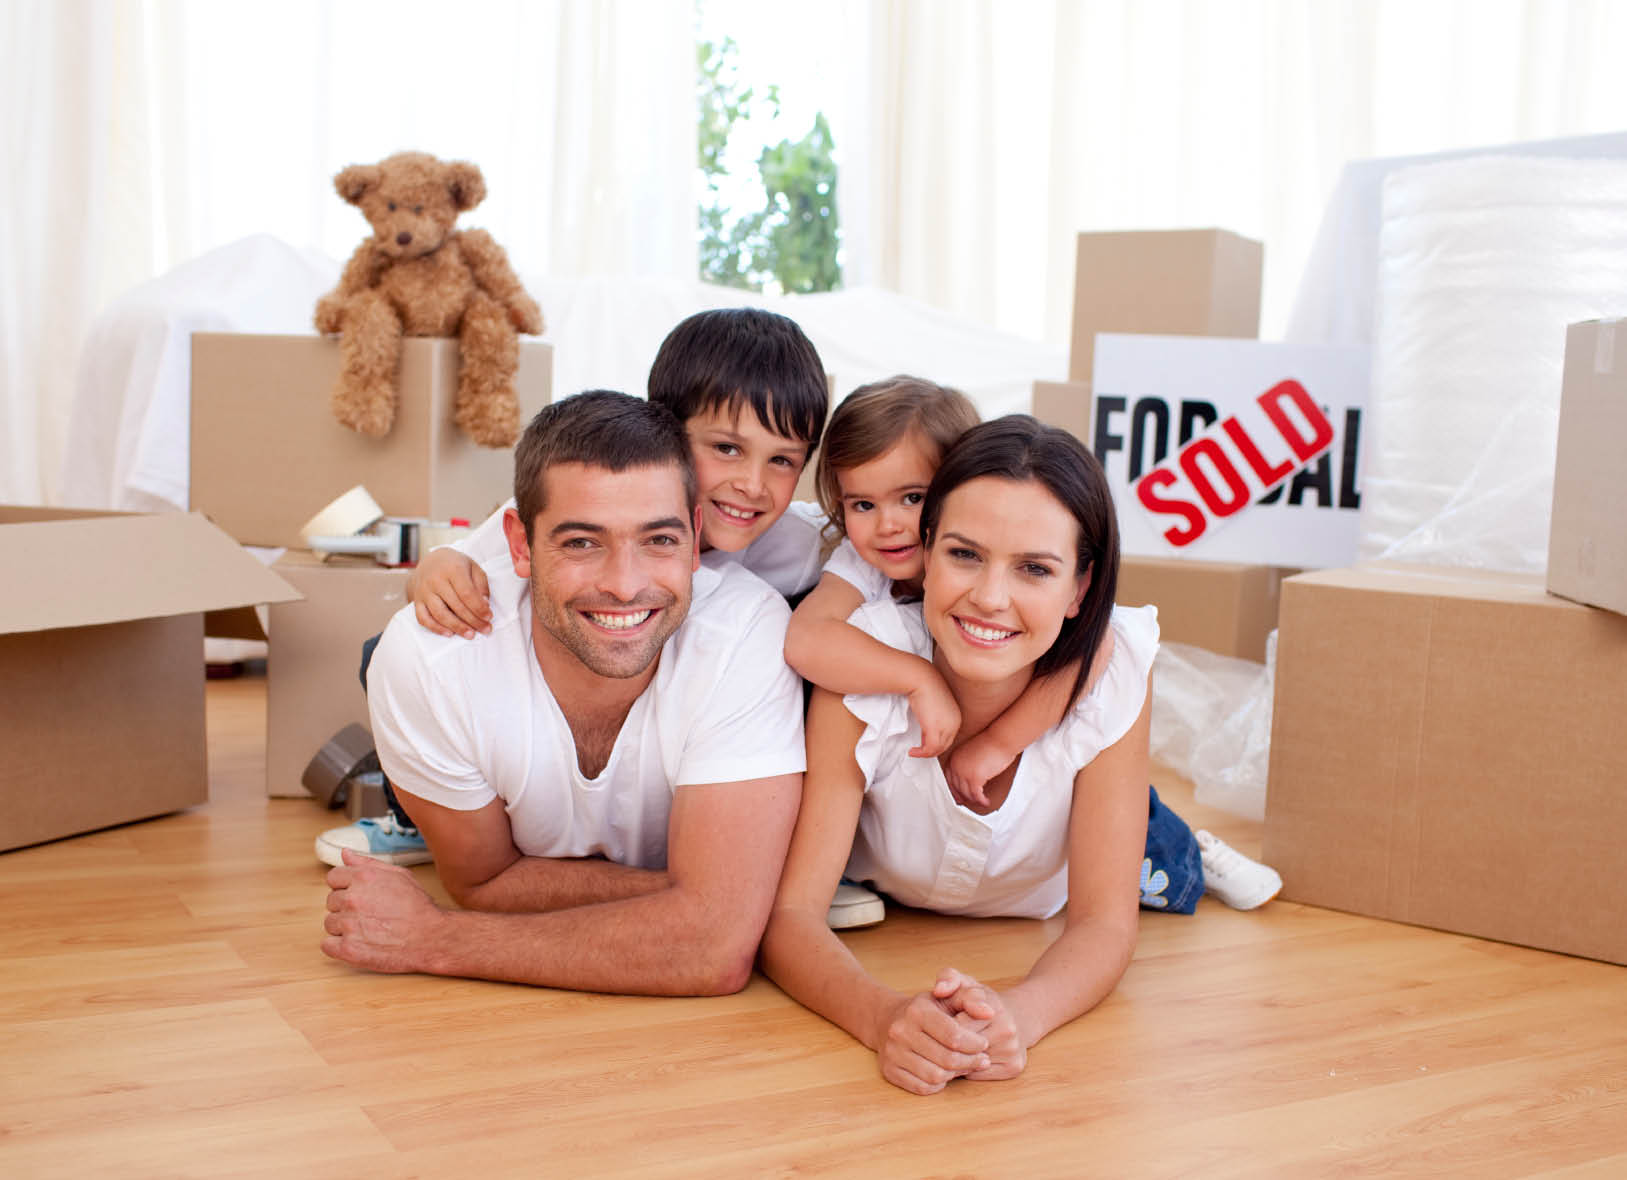 Coldwell Banker Near Me - Buy Homes Westfield, NJ - Homes for Sale Westfield, NJ